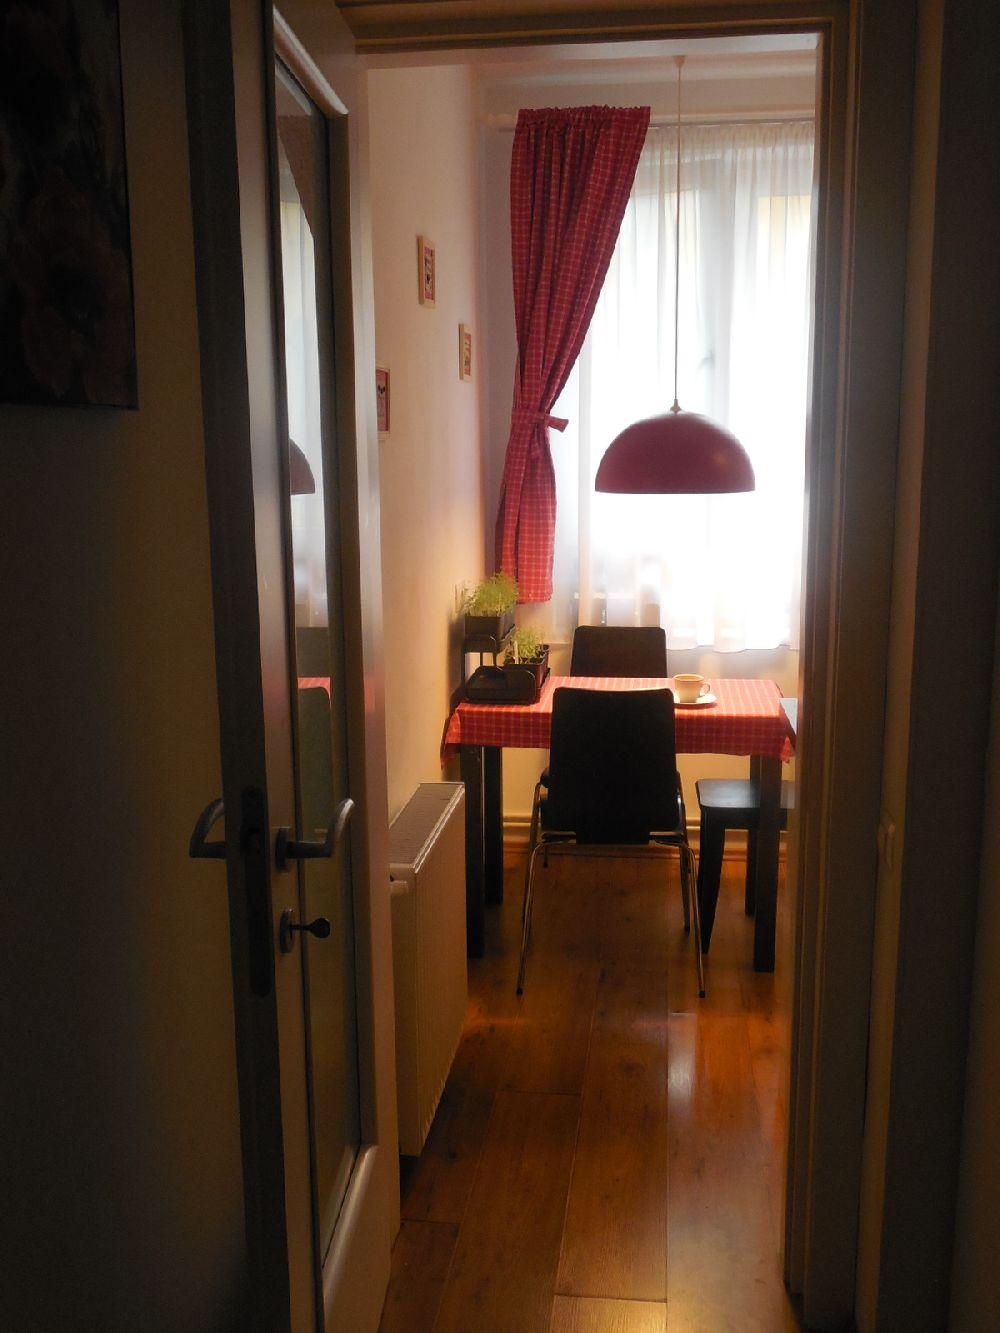 adelaparvu.com despre amenajare apartament 3 camere Bucuresti, design interior Iulia Banu (2)